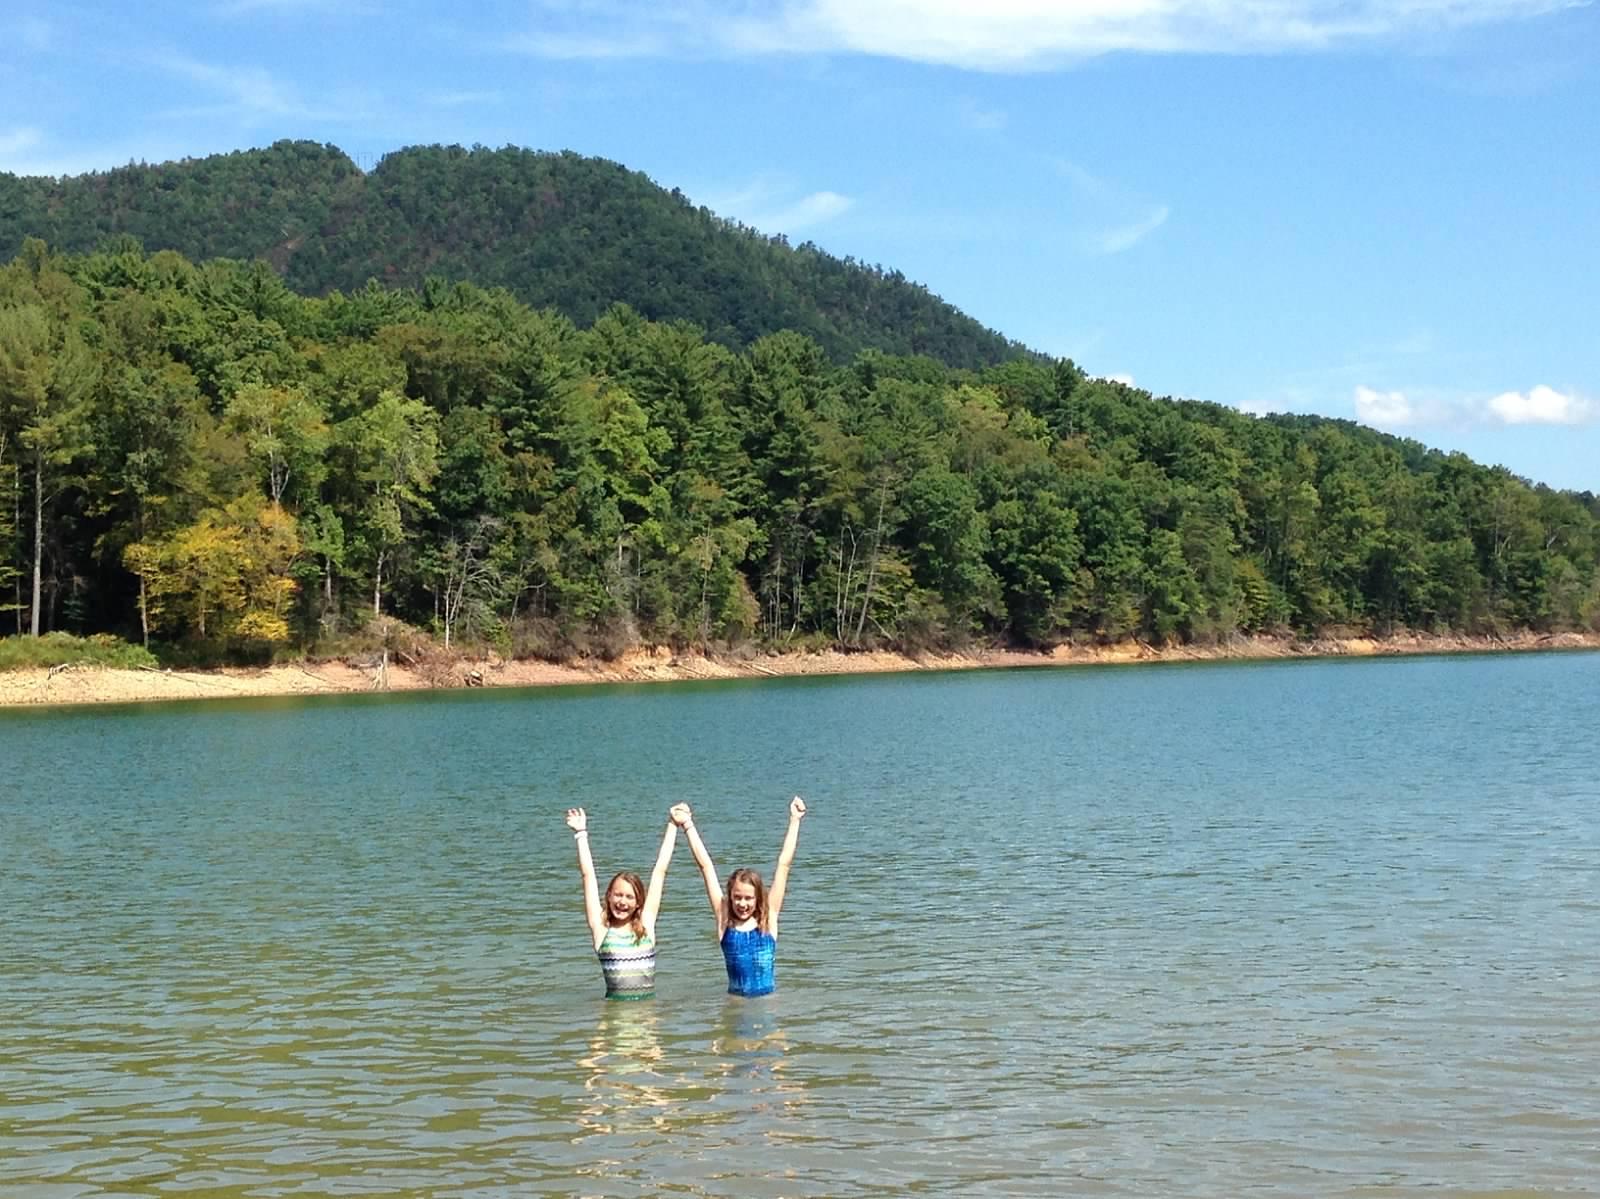 Having fun at the lake